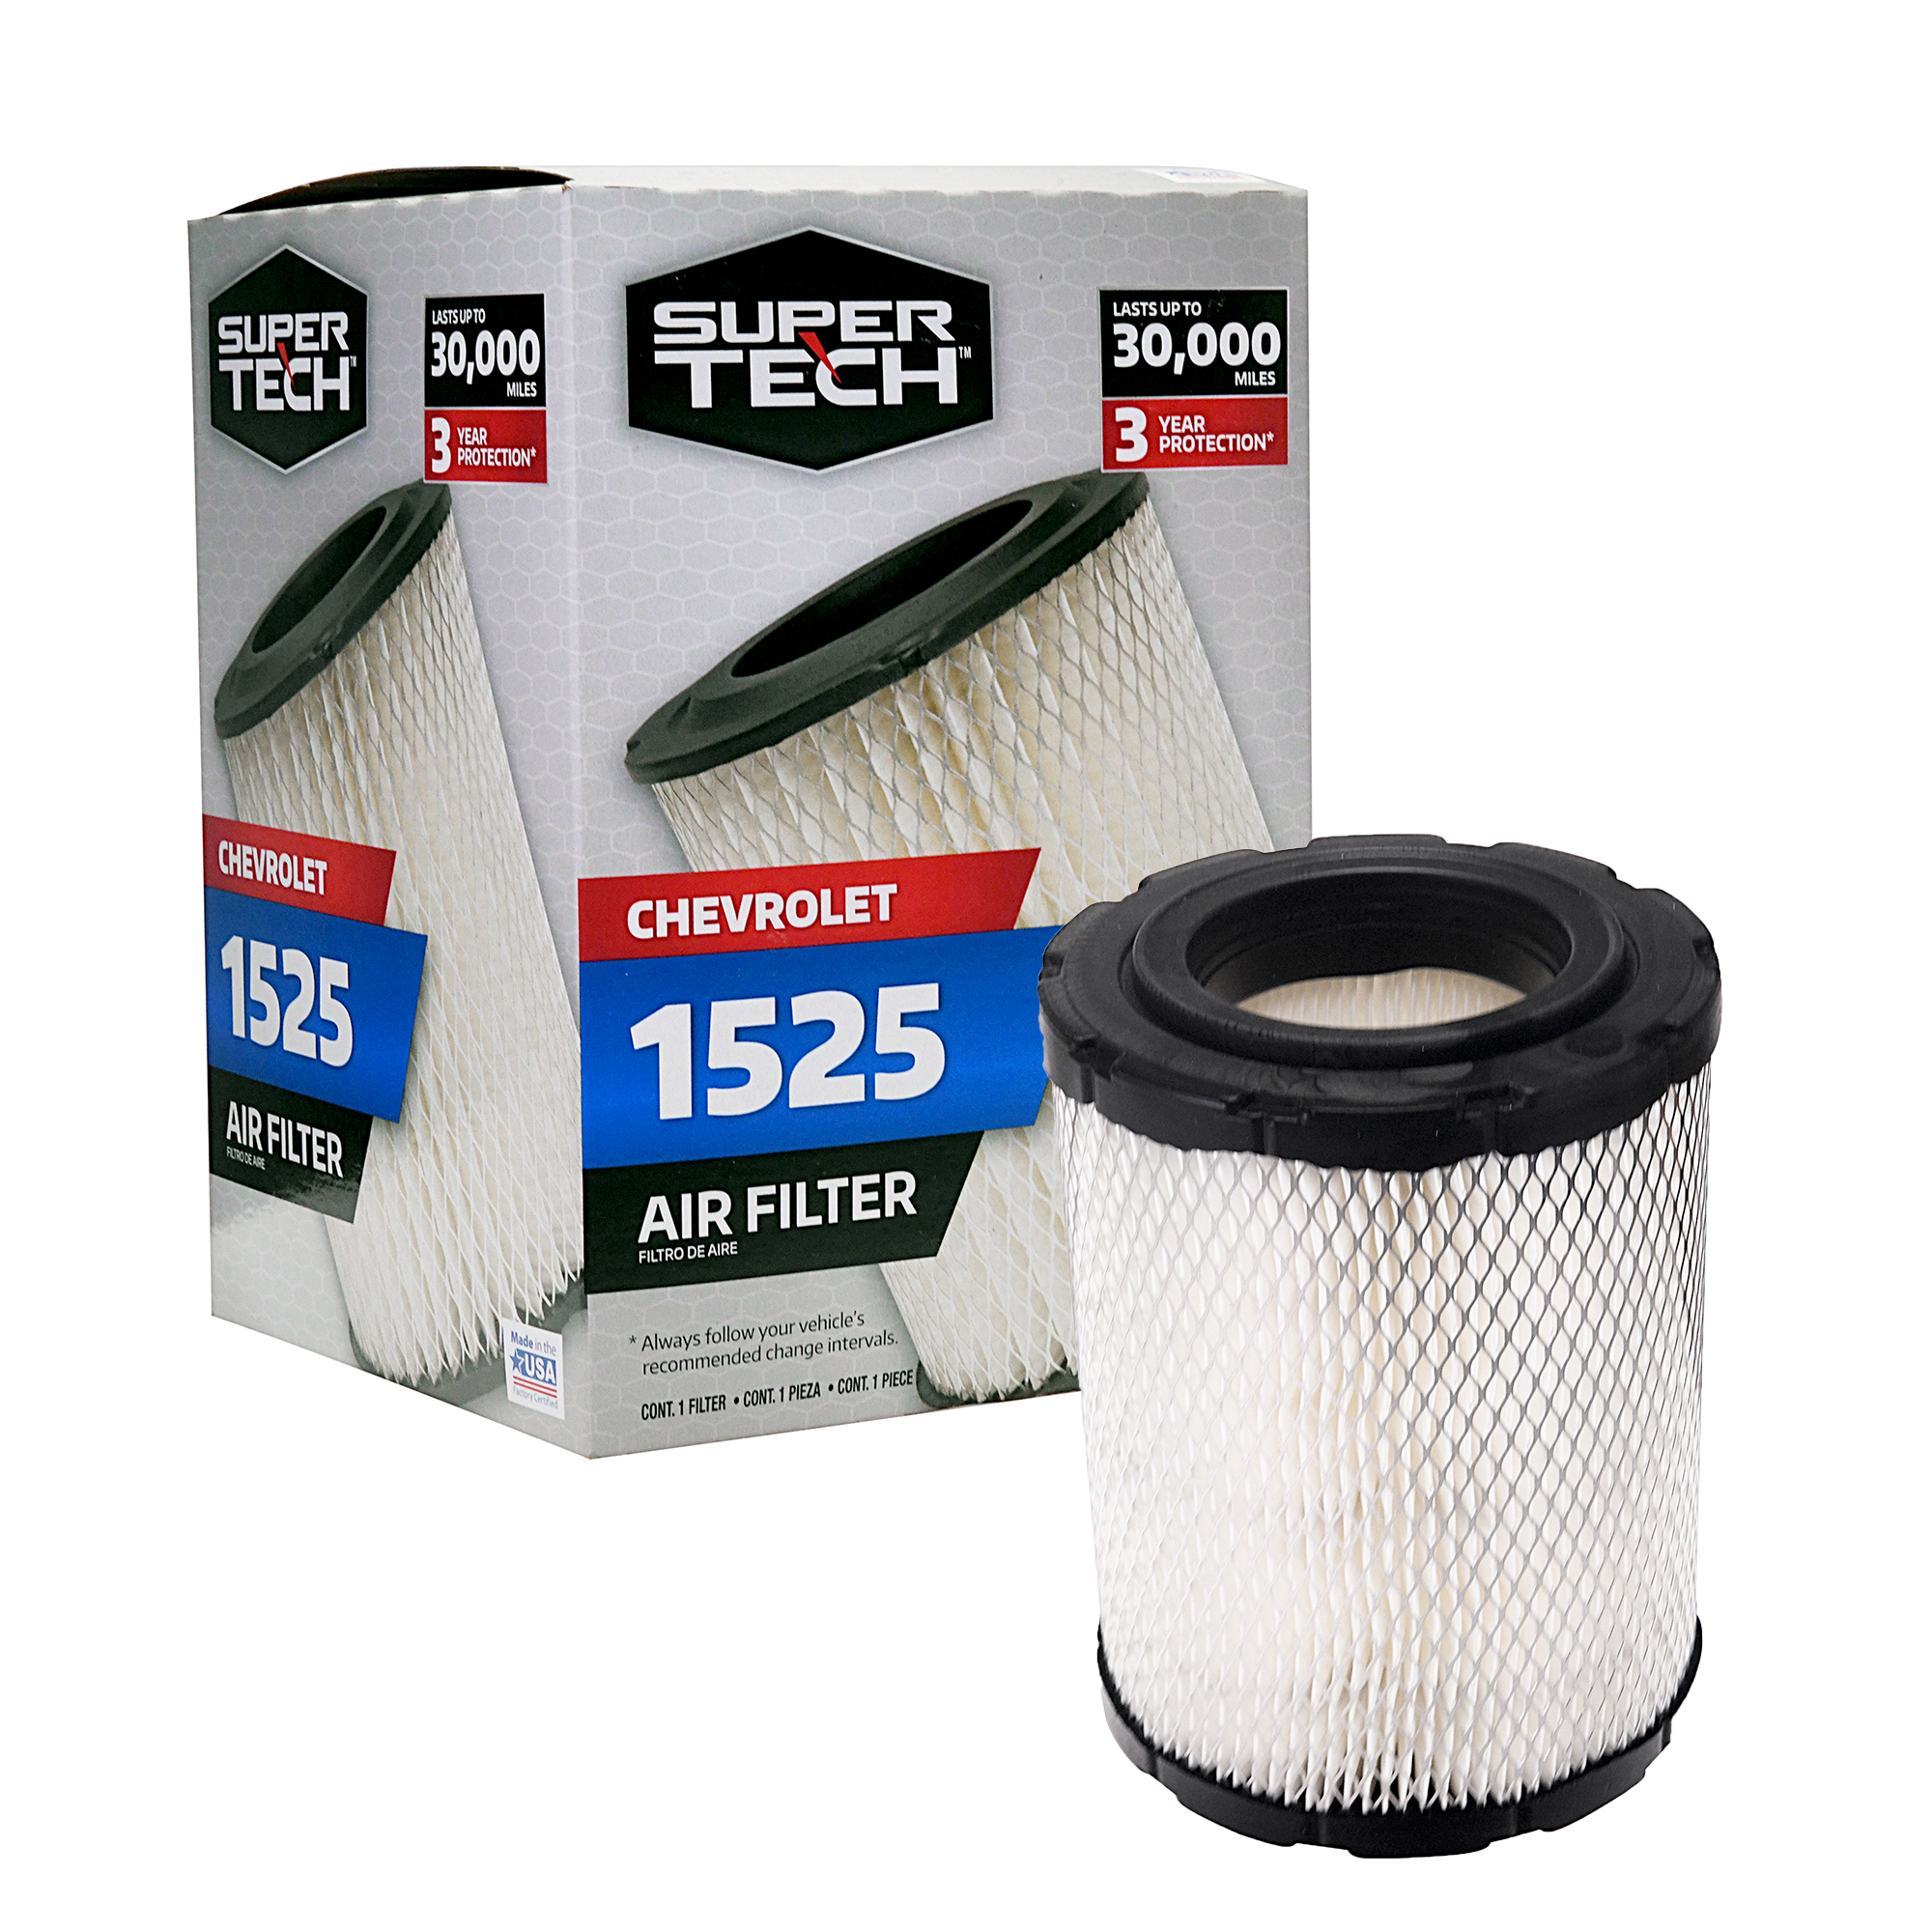 Supertech 1525 Engine Air Filter Replacement Filter For Gm Or Chevrolet Walmart Com Walmart Com